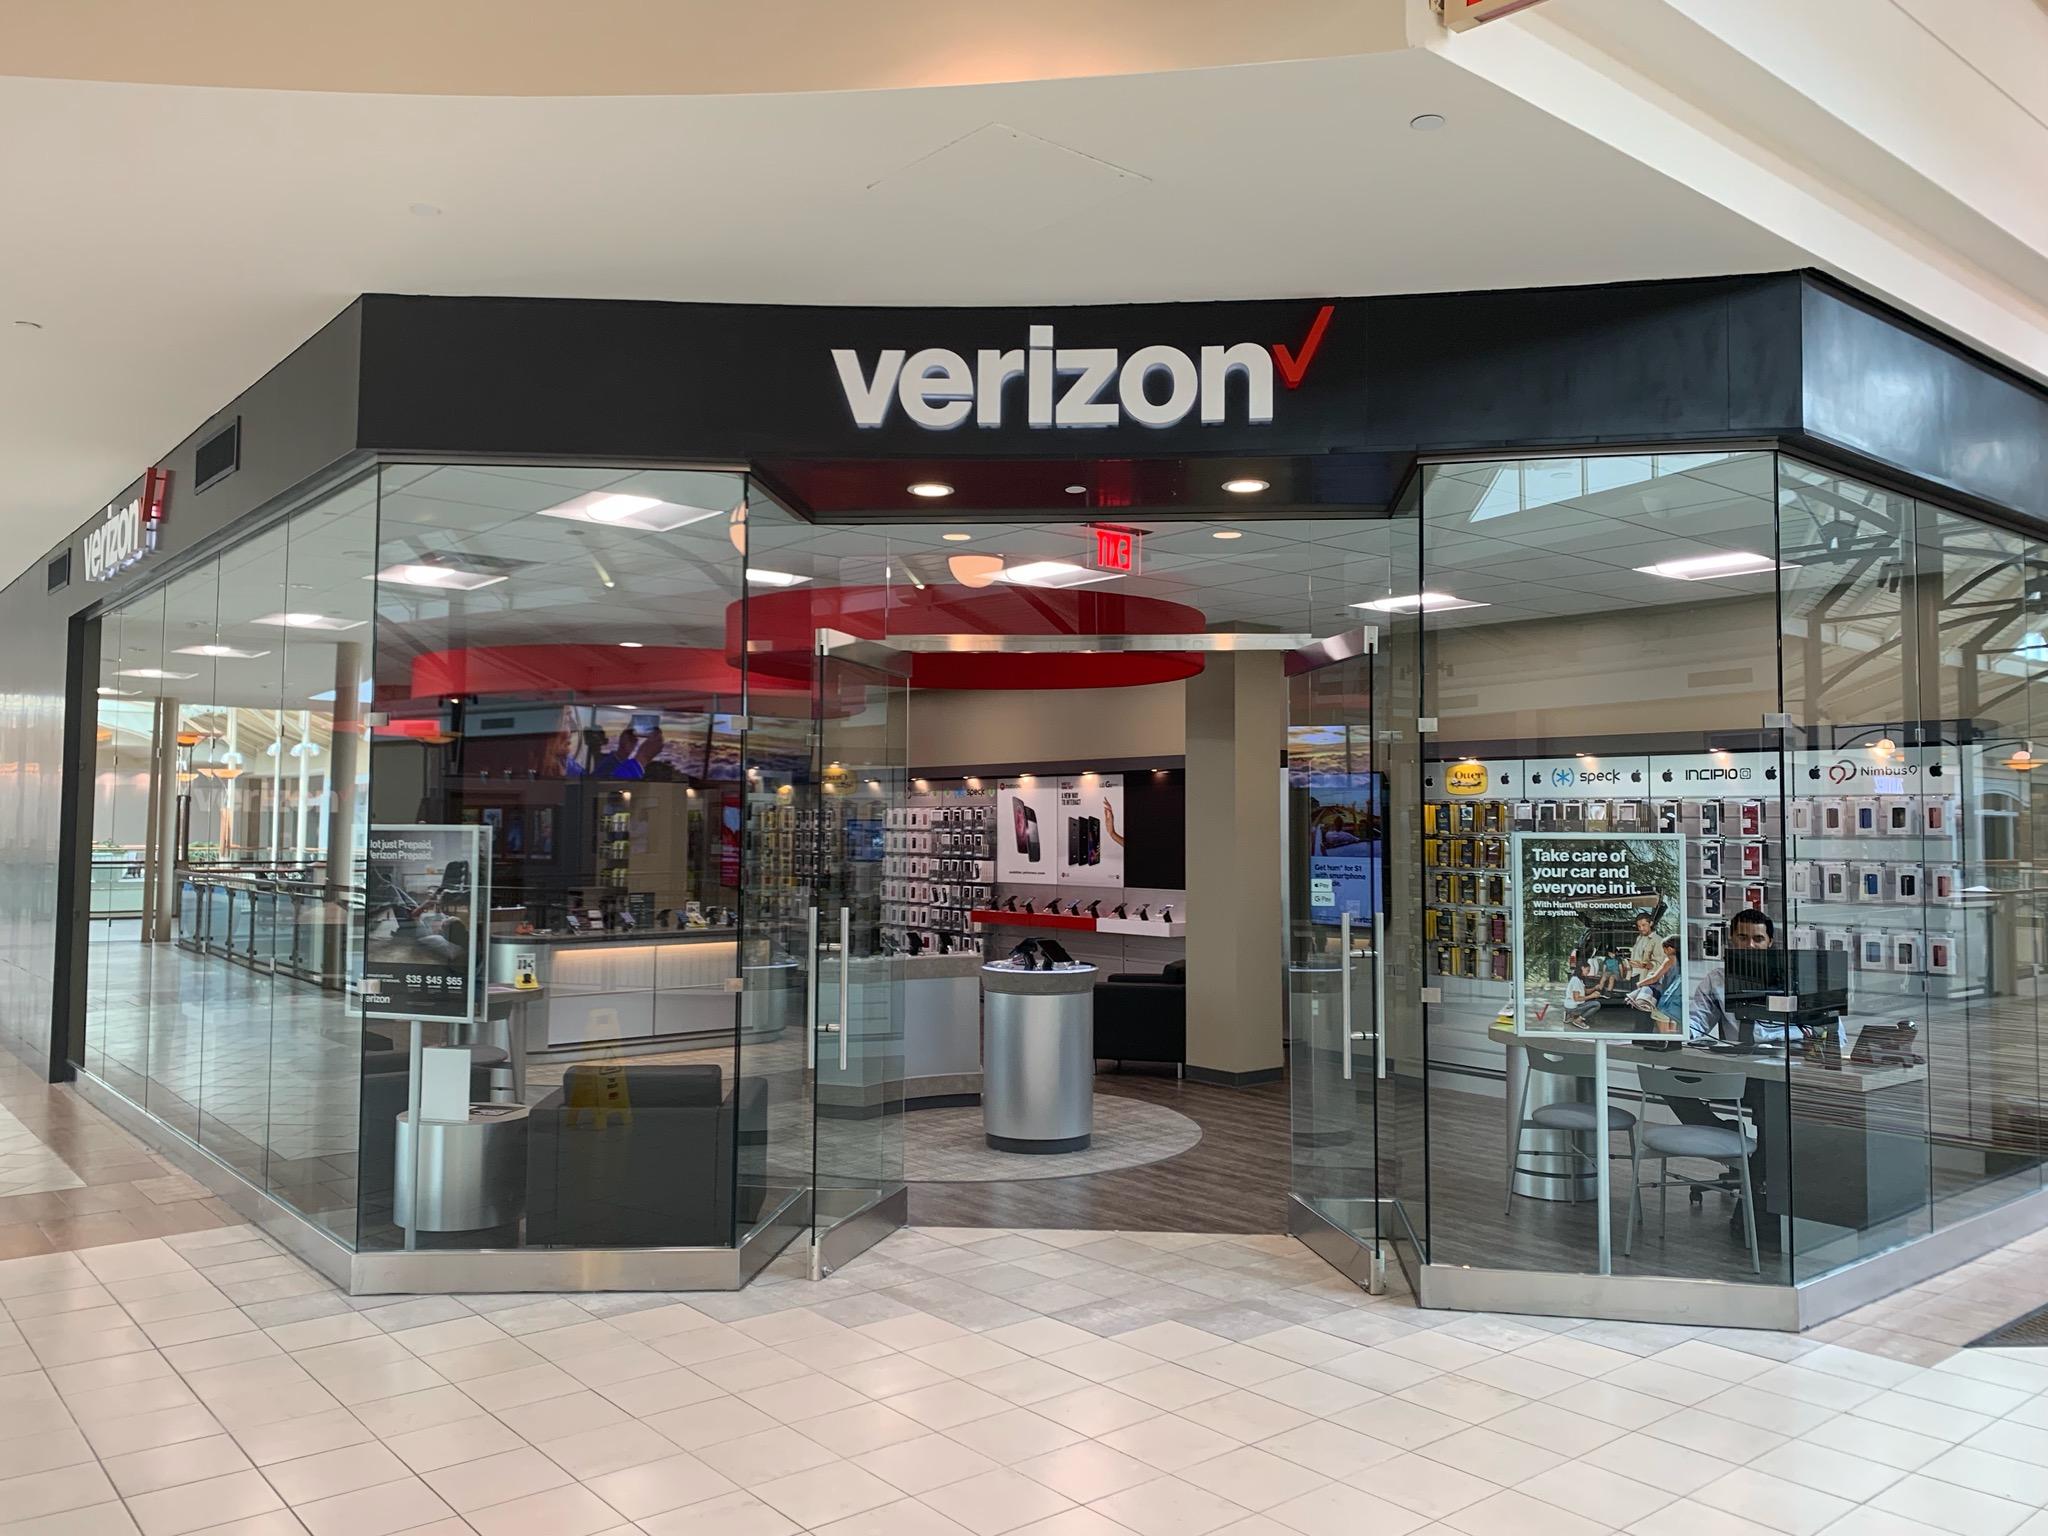 968662d2250 Verizon Wireless Near Me In Dulles, VA | Dulles Town Center